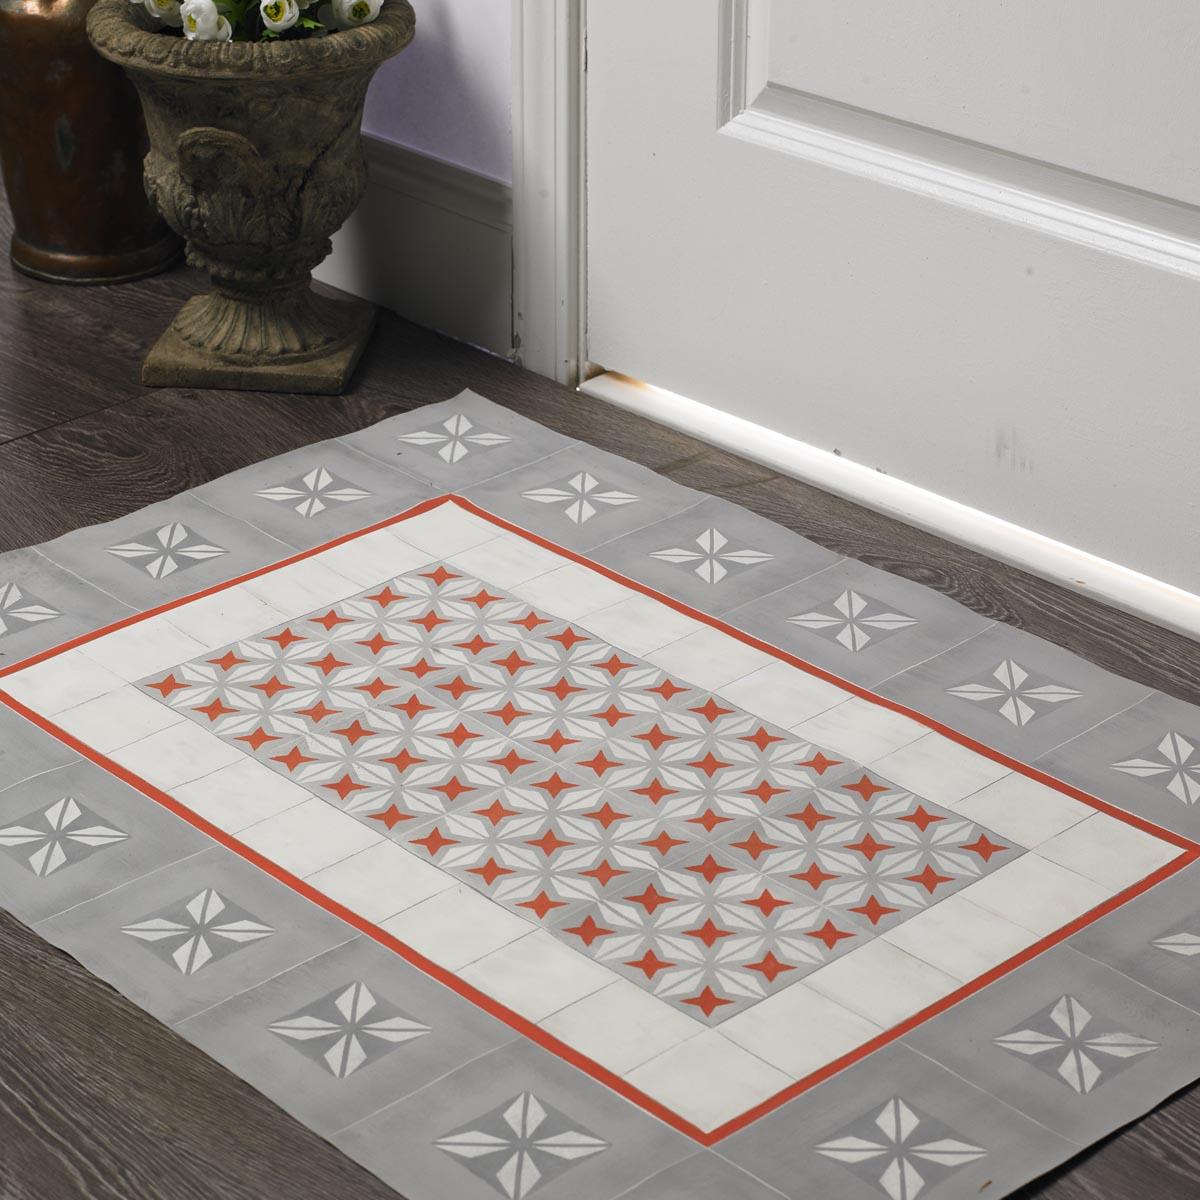 FolkArt ® Painting Stencils - Starburst Tile